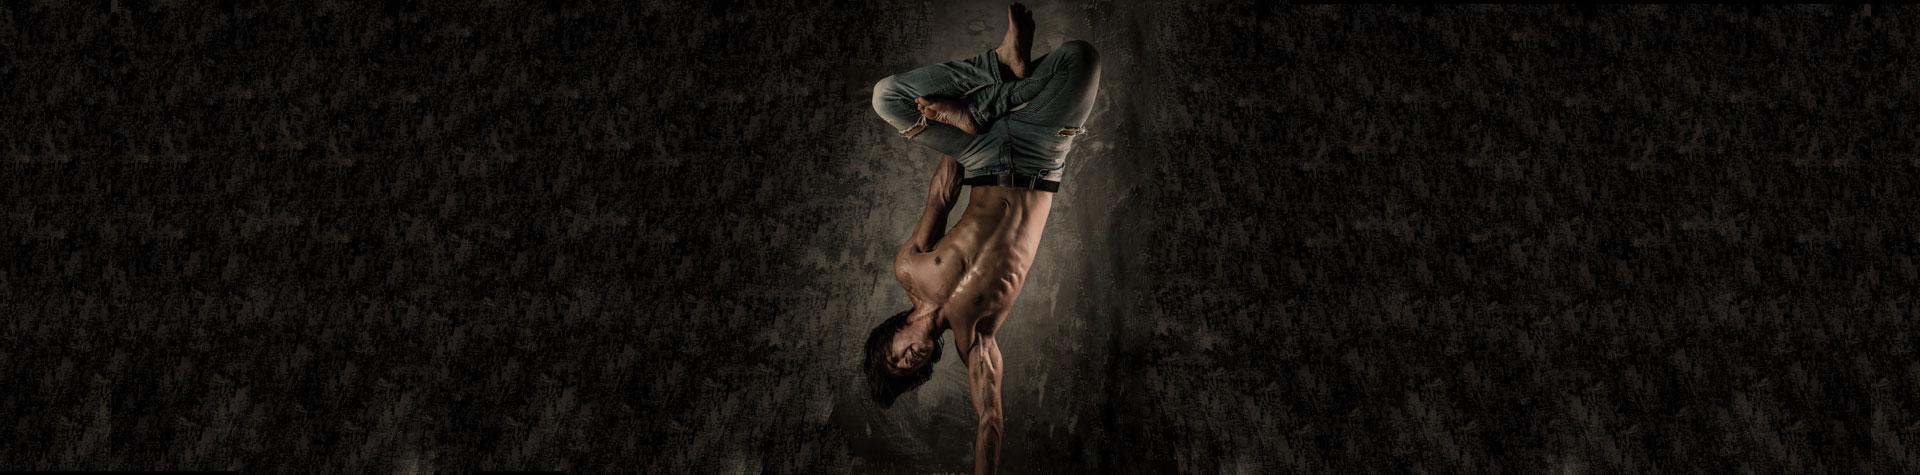 Kurse Dance Academy